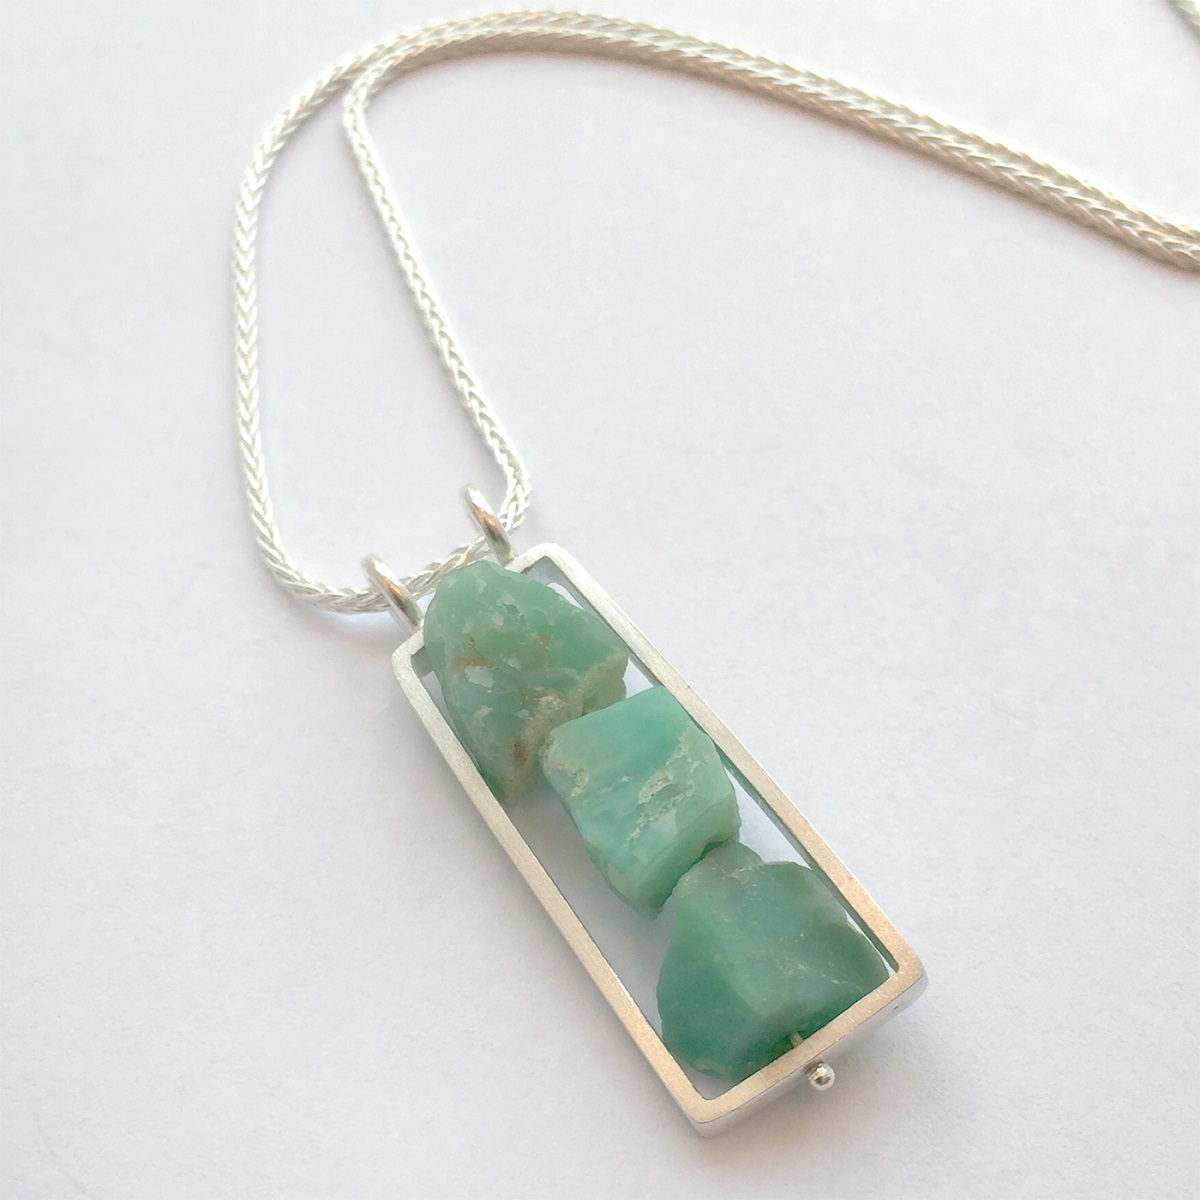 Ashka gemstones sterling silver jewelry